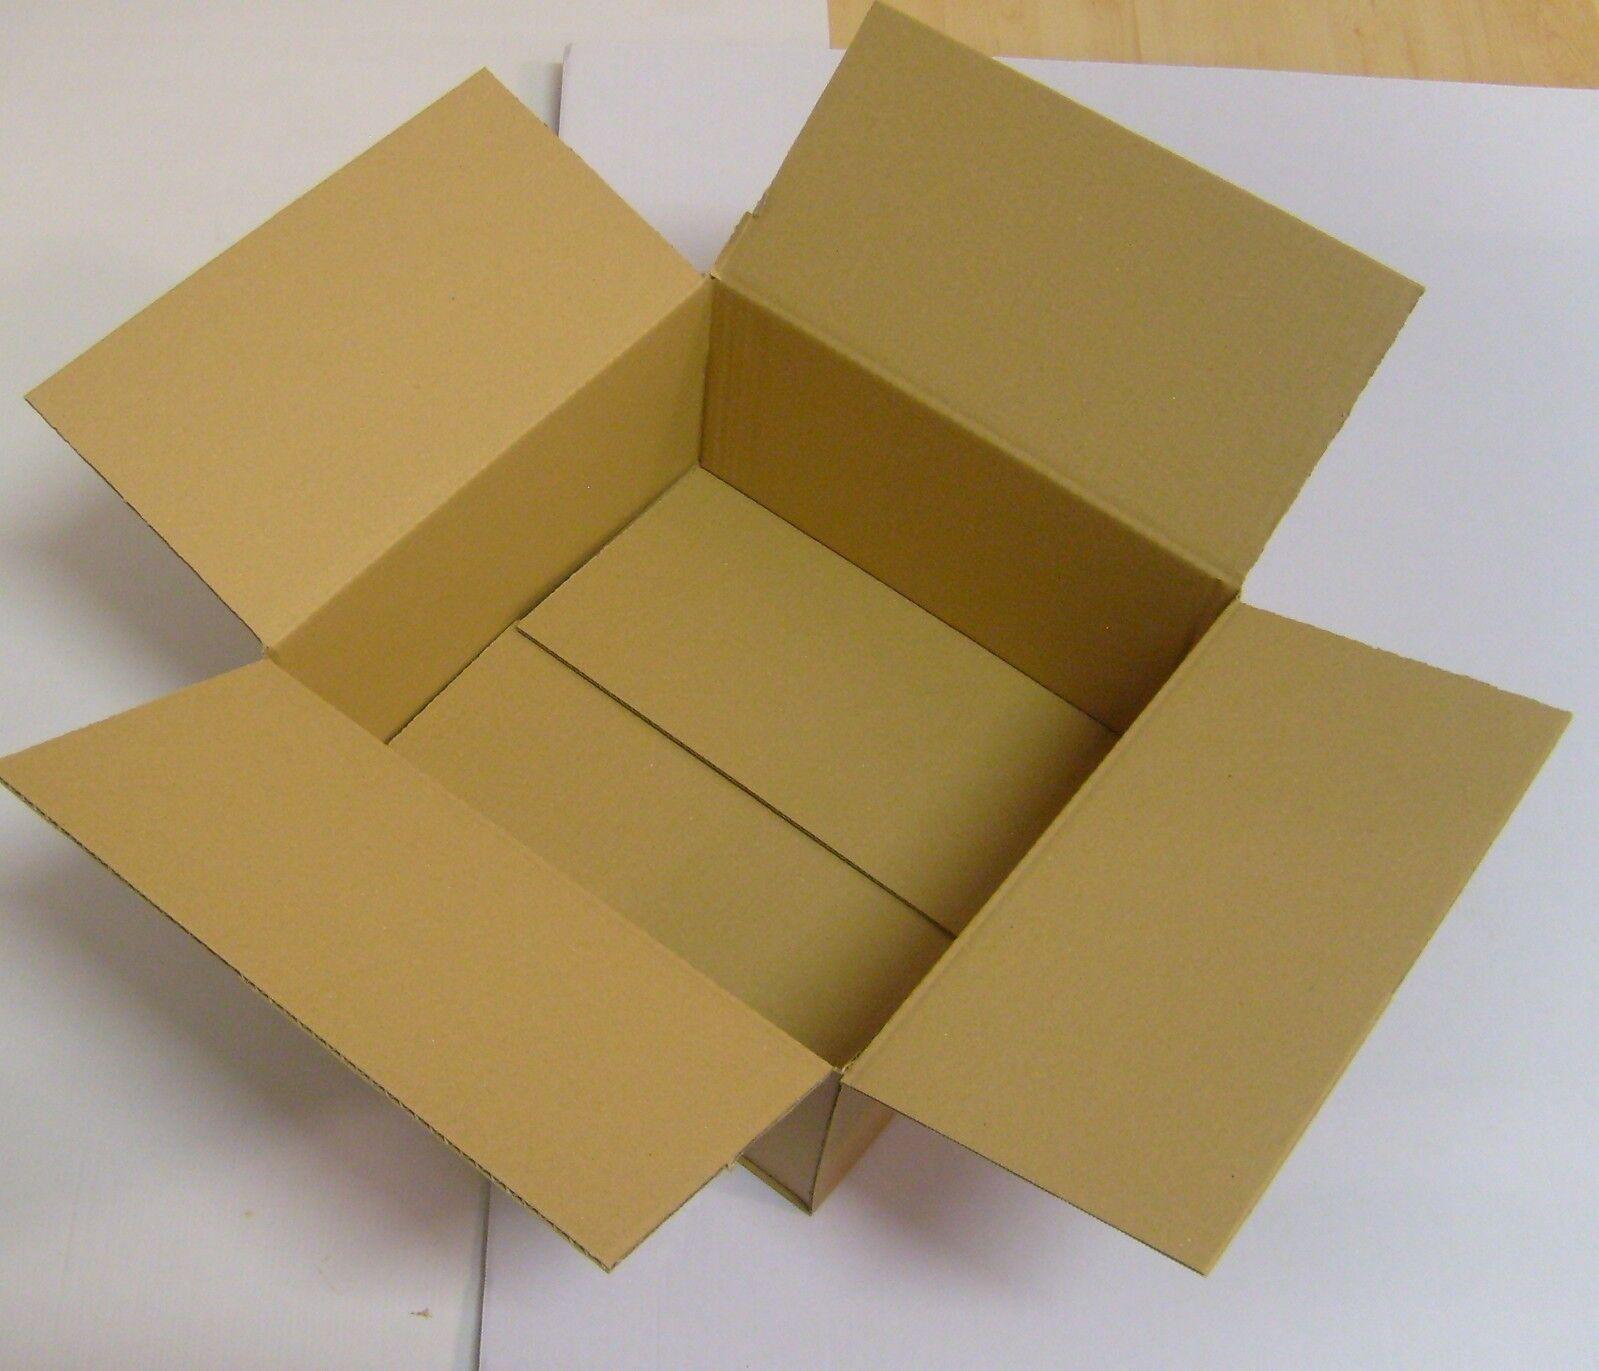 20x Faltkarton Karton 300x300x150 Faltschachtel Verpackungen Versandkarton DHL